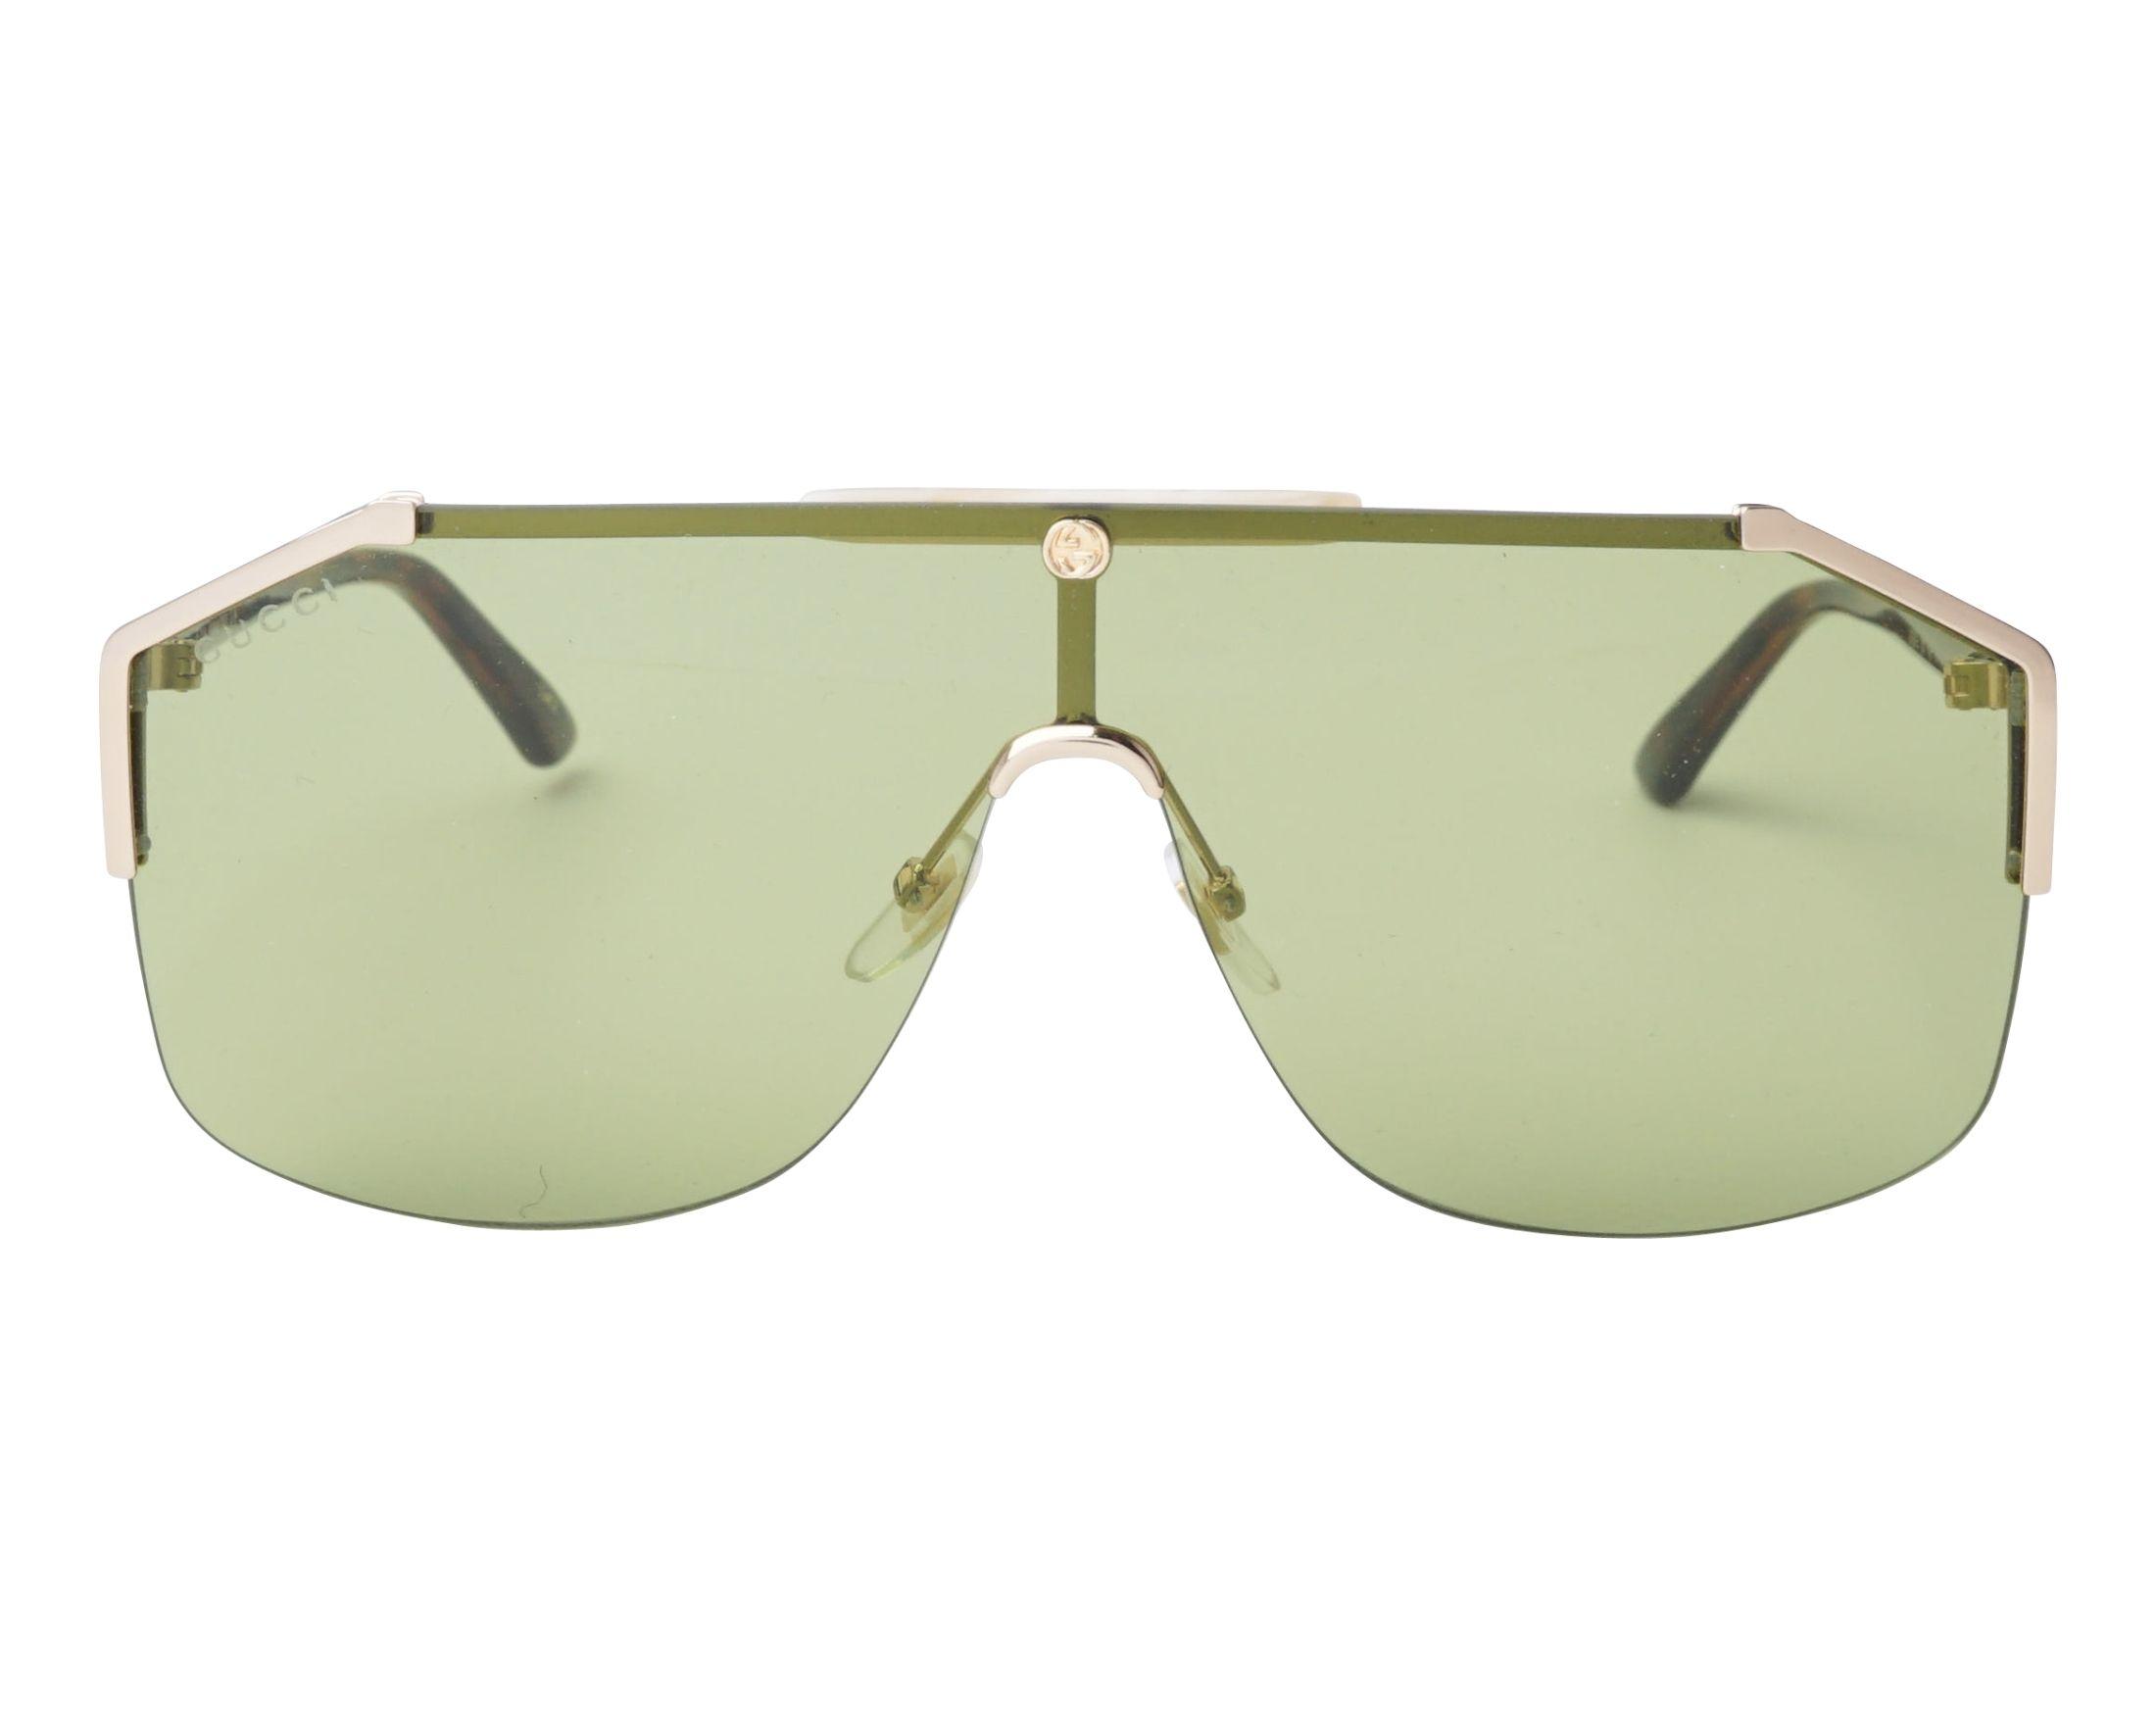 2c40833ae48 Sunglasses Gucci GG-0291-S 004 99-1 Gold Havana front view